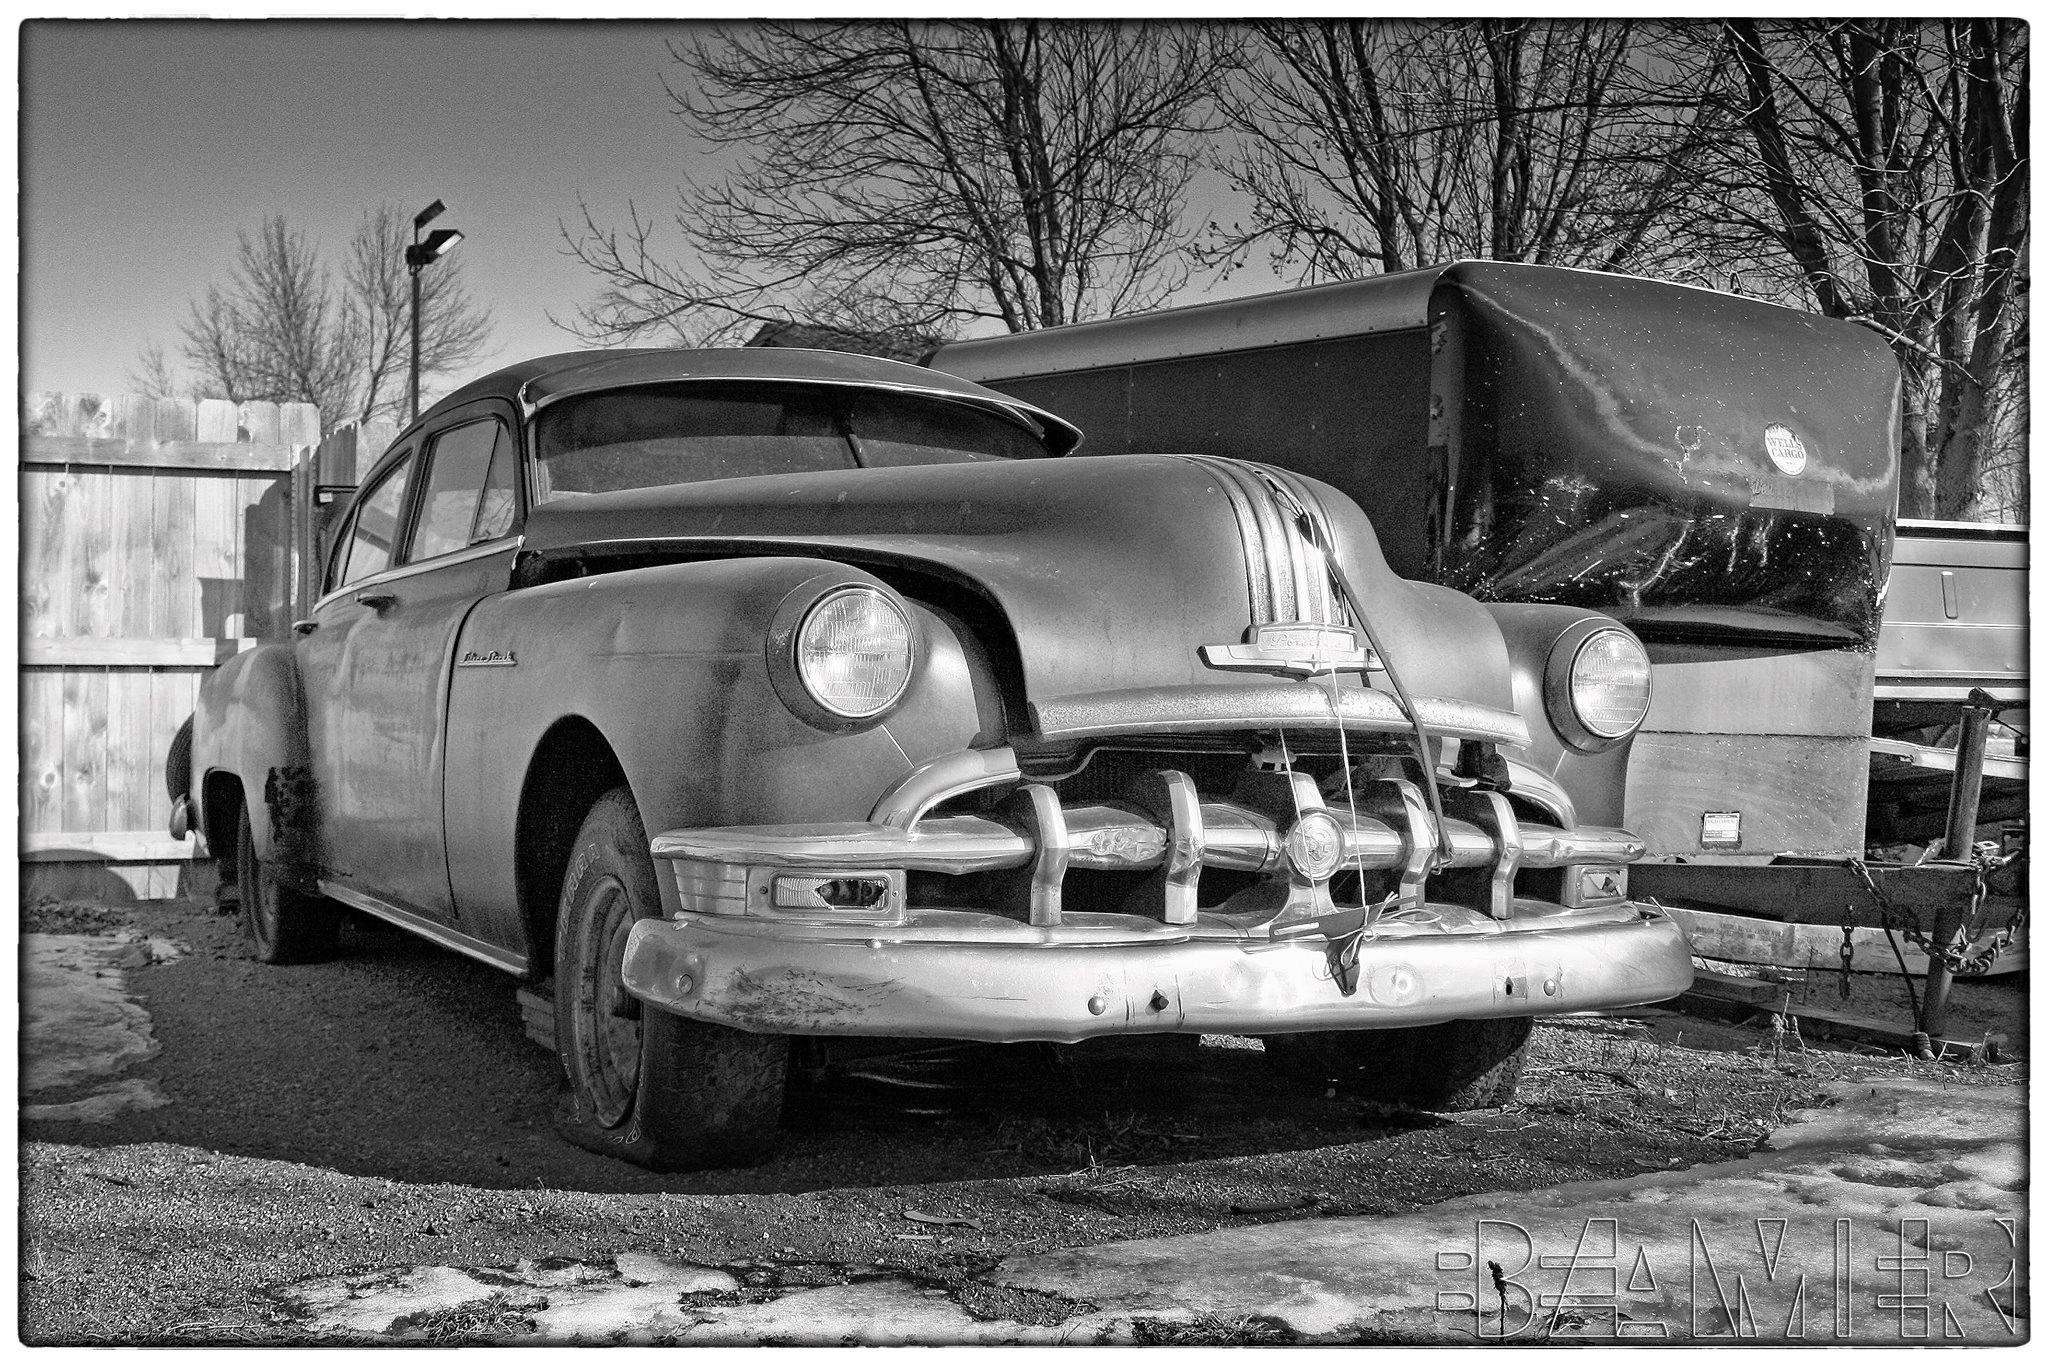 Artist Jason Beamguard photo Minnesota 2012